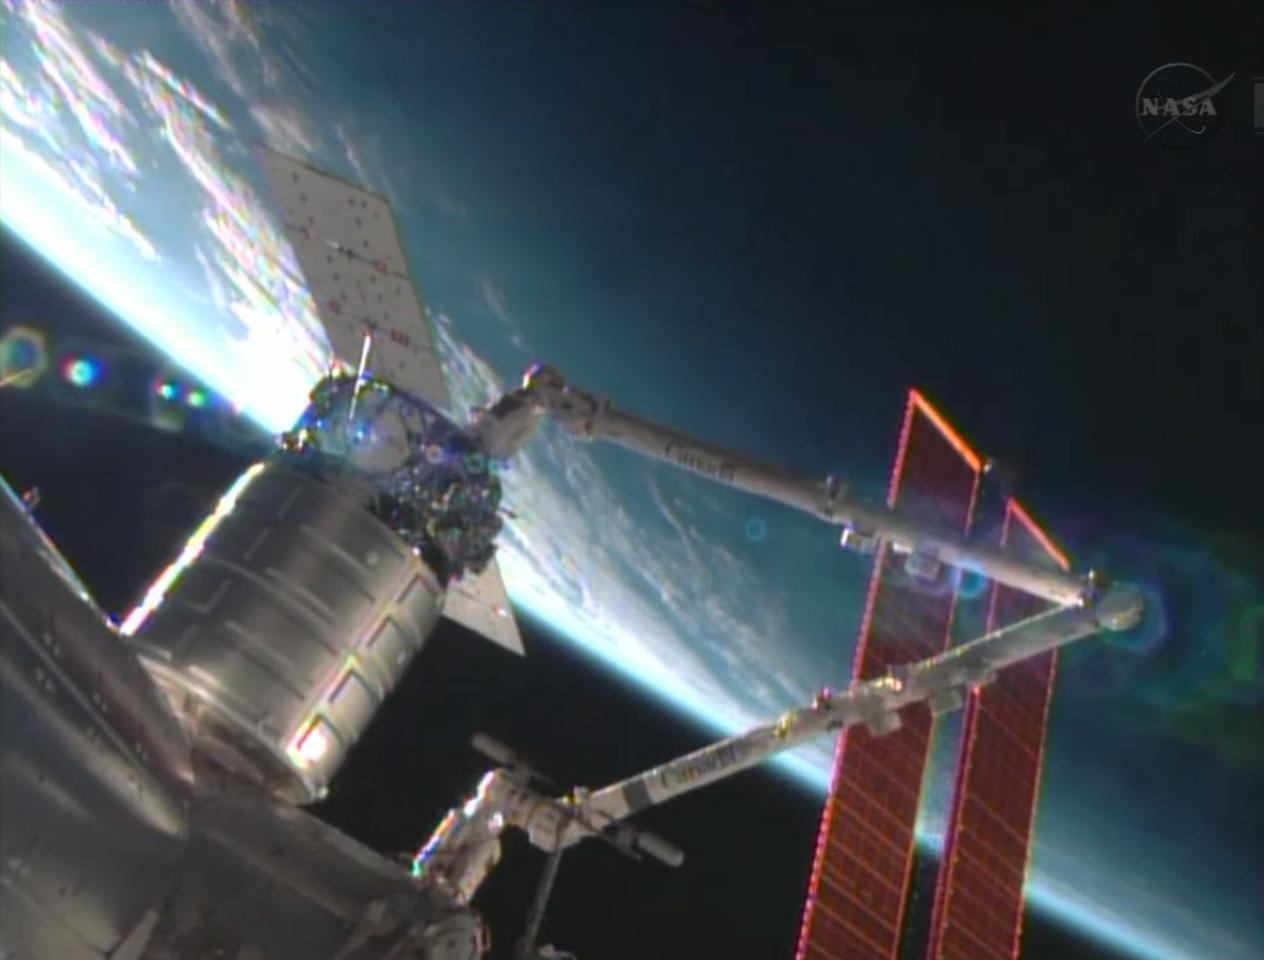 Cygnus docking with the ISS (Image: NASA)